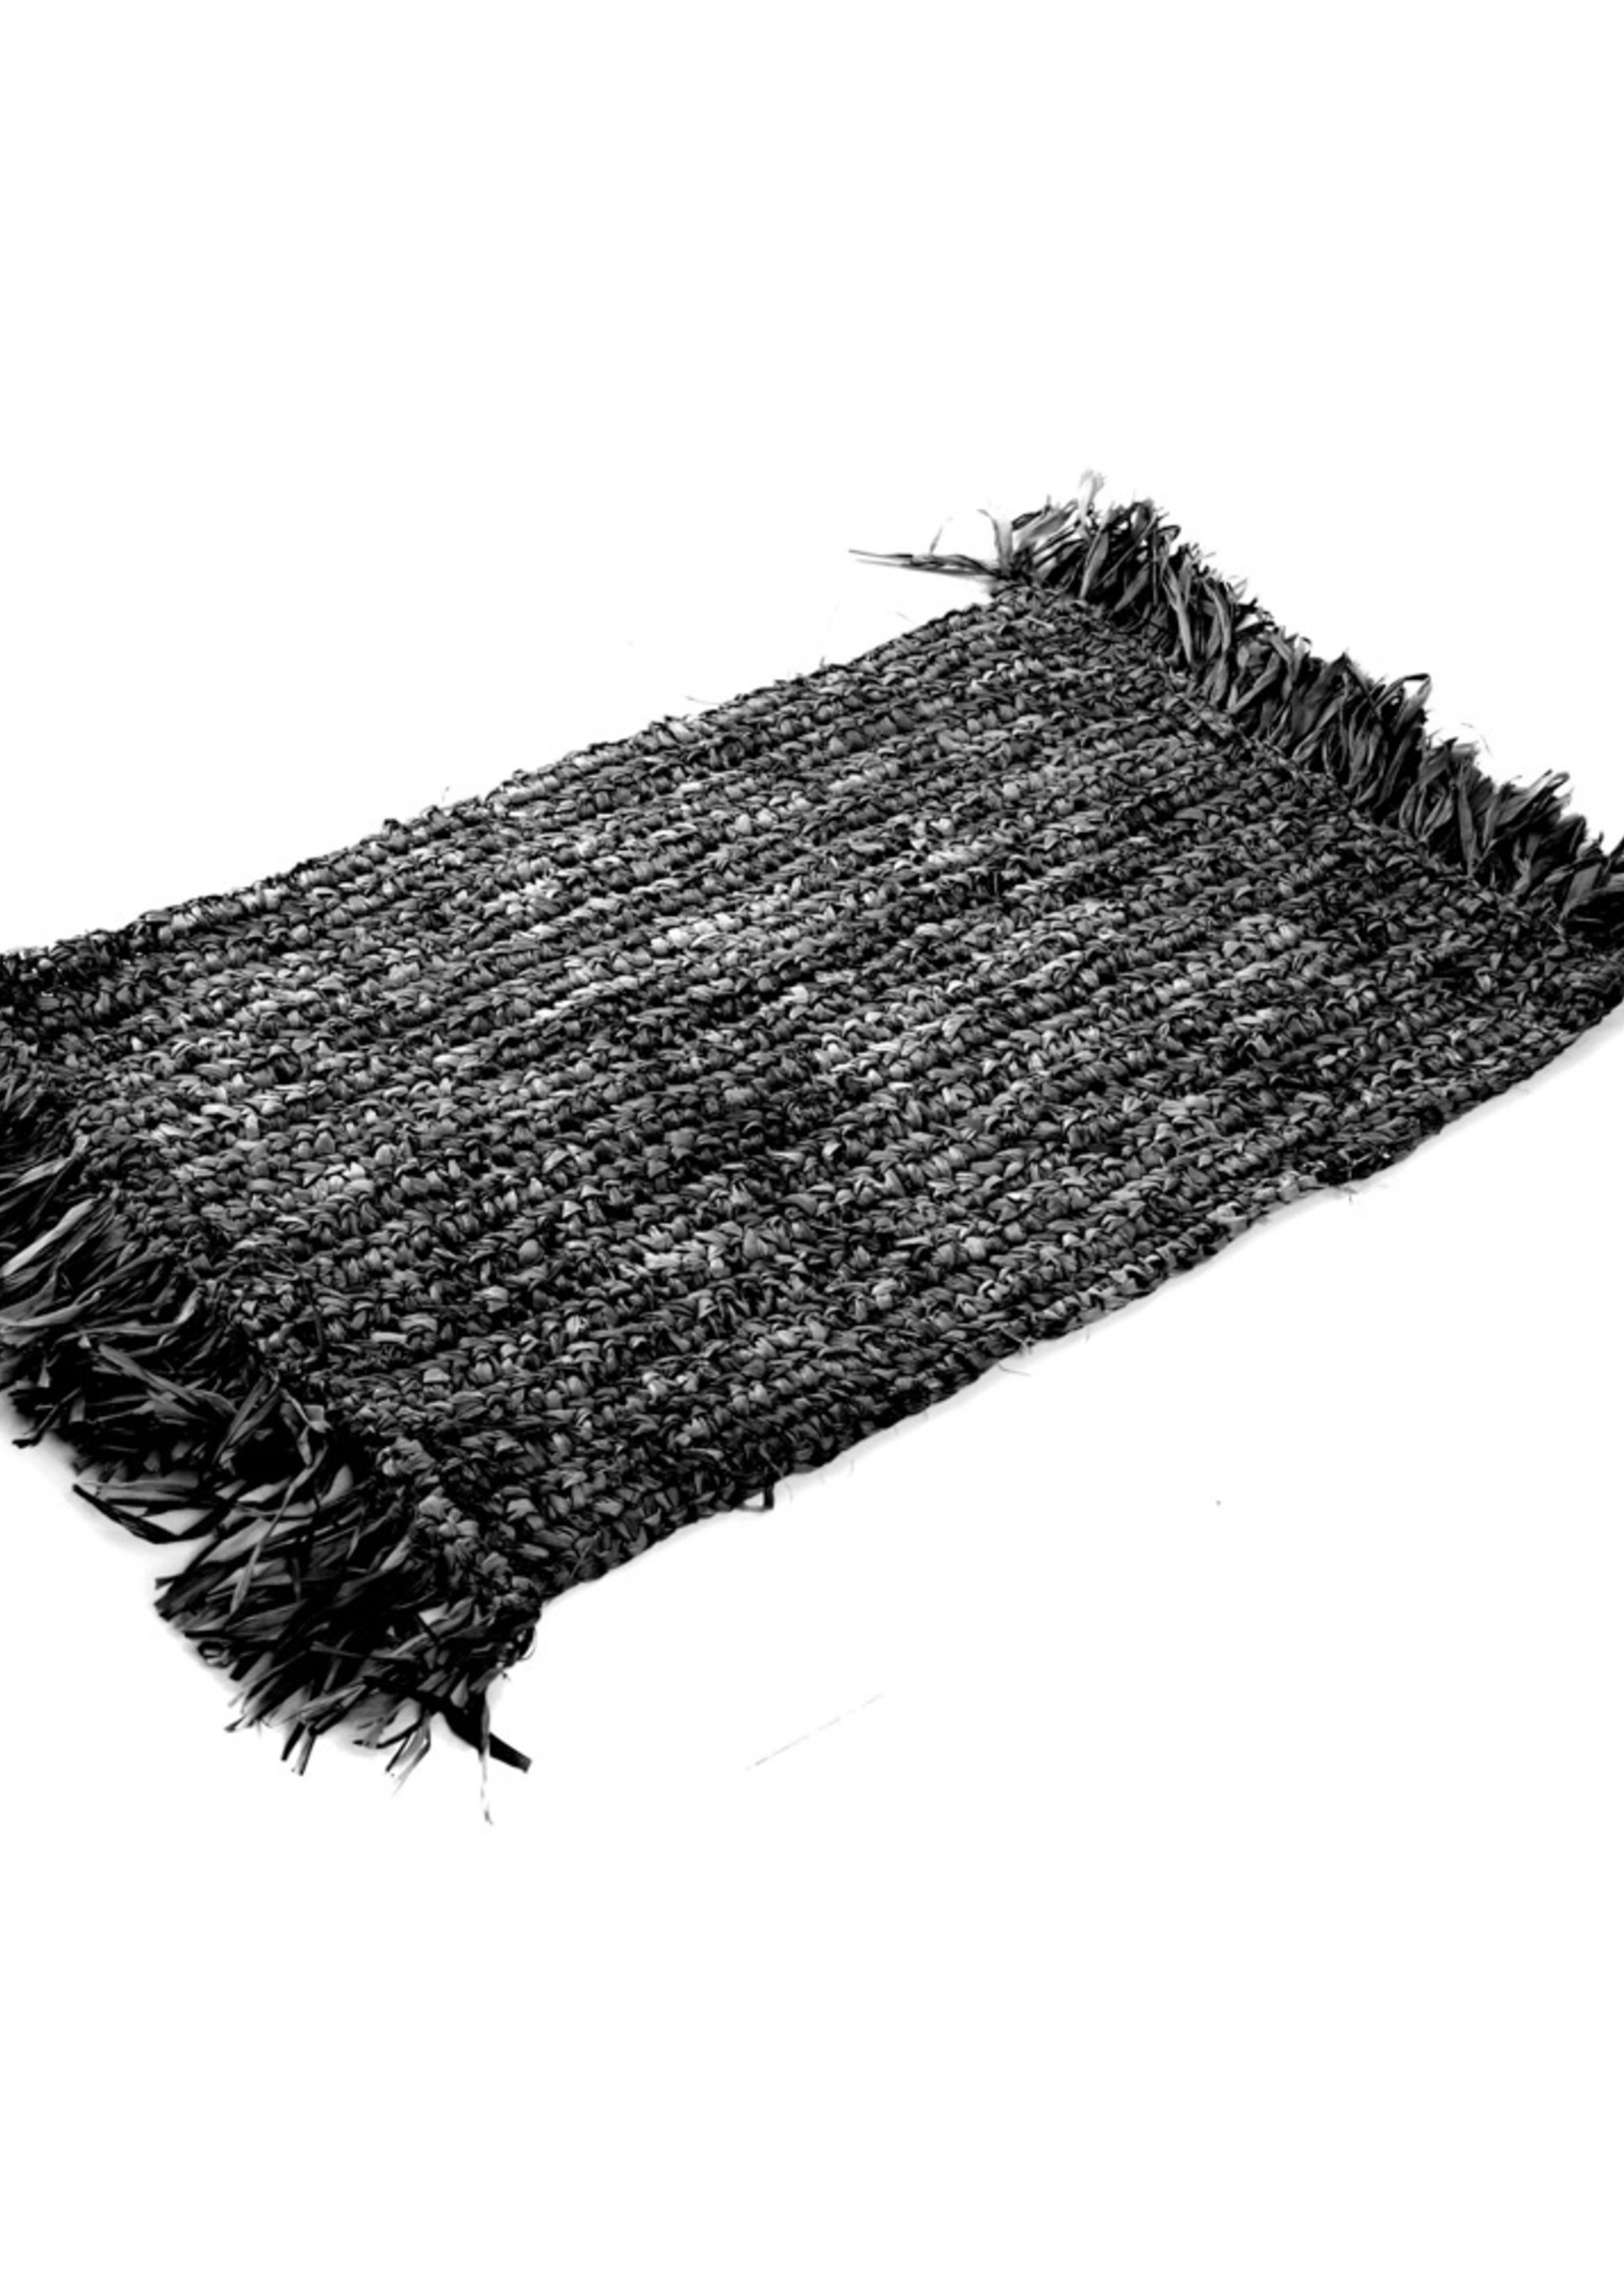 The Fringe Raffia Placemat Rectangular - Black